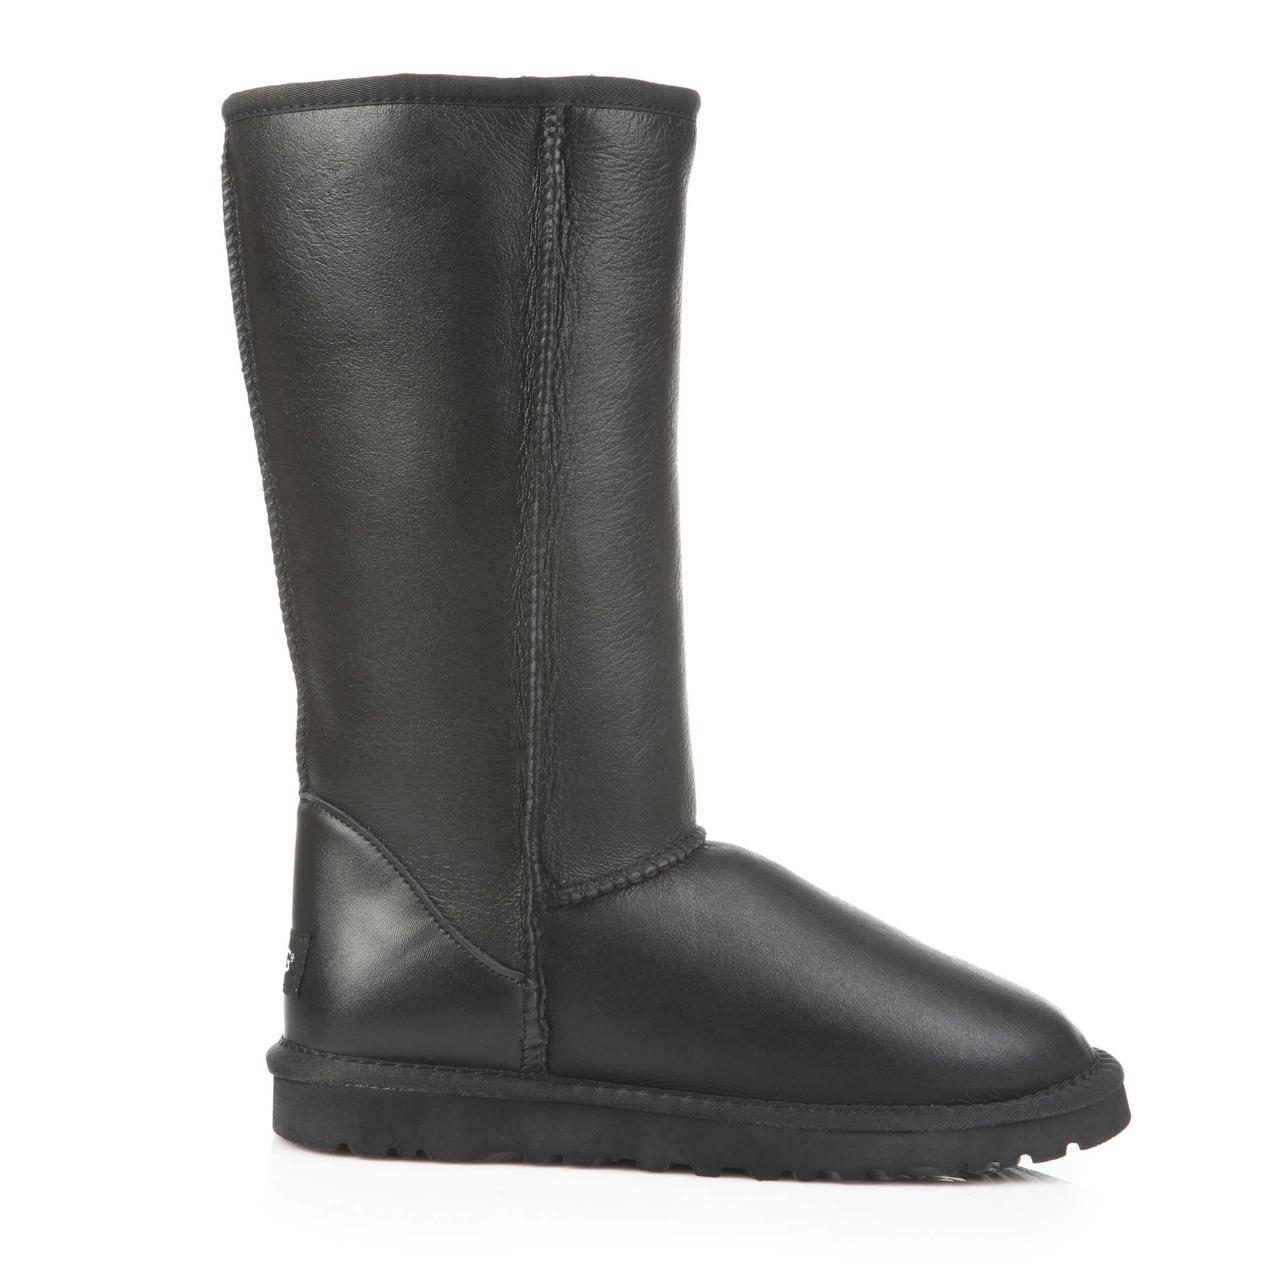 Угги Ugg Australia Classic Tall Metallic Black Leather